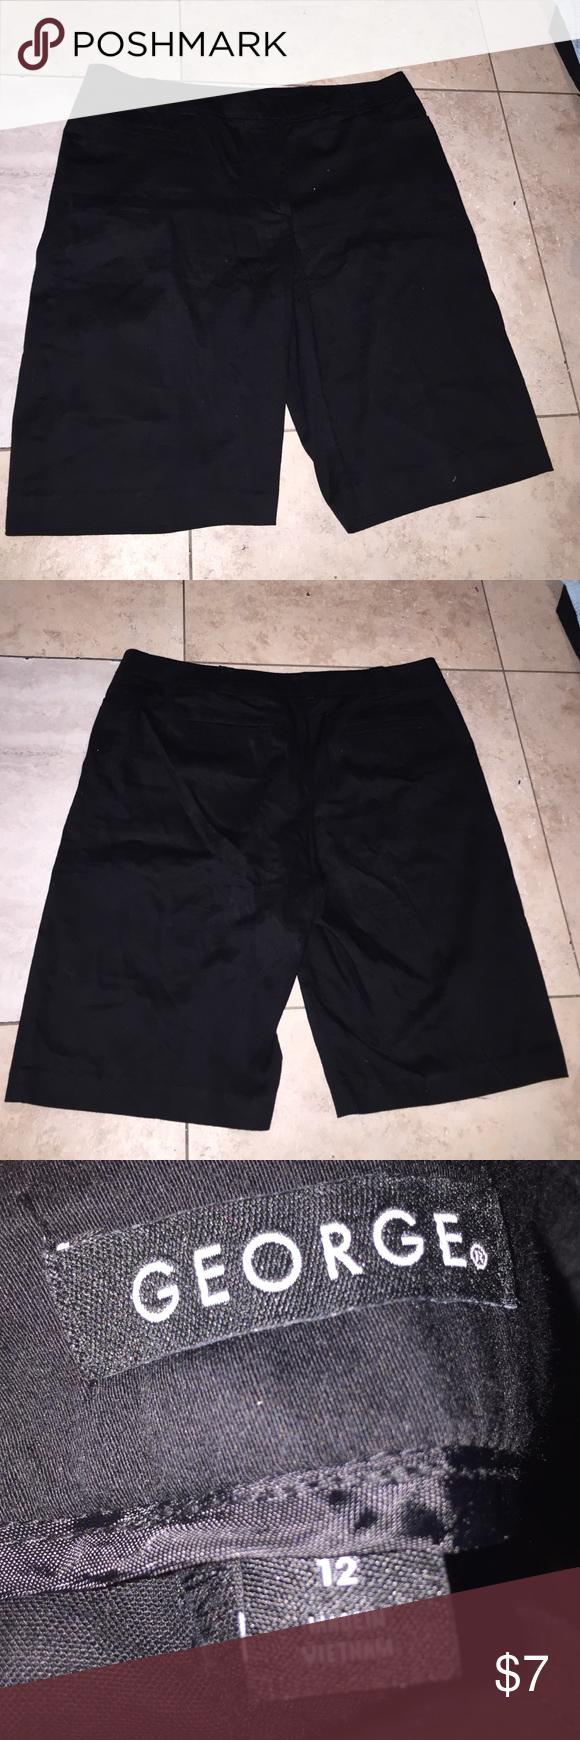 Black Shorts size 12 Nice Black Shorts size 12 very Comfortable George Shorts Bermudas